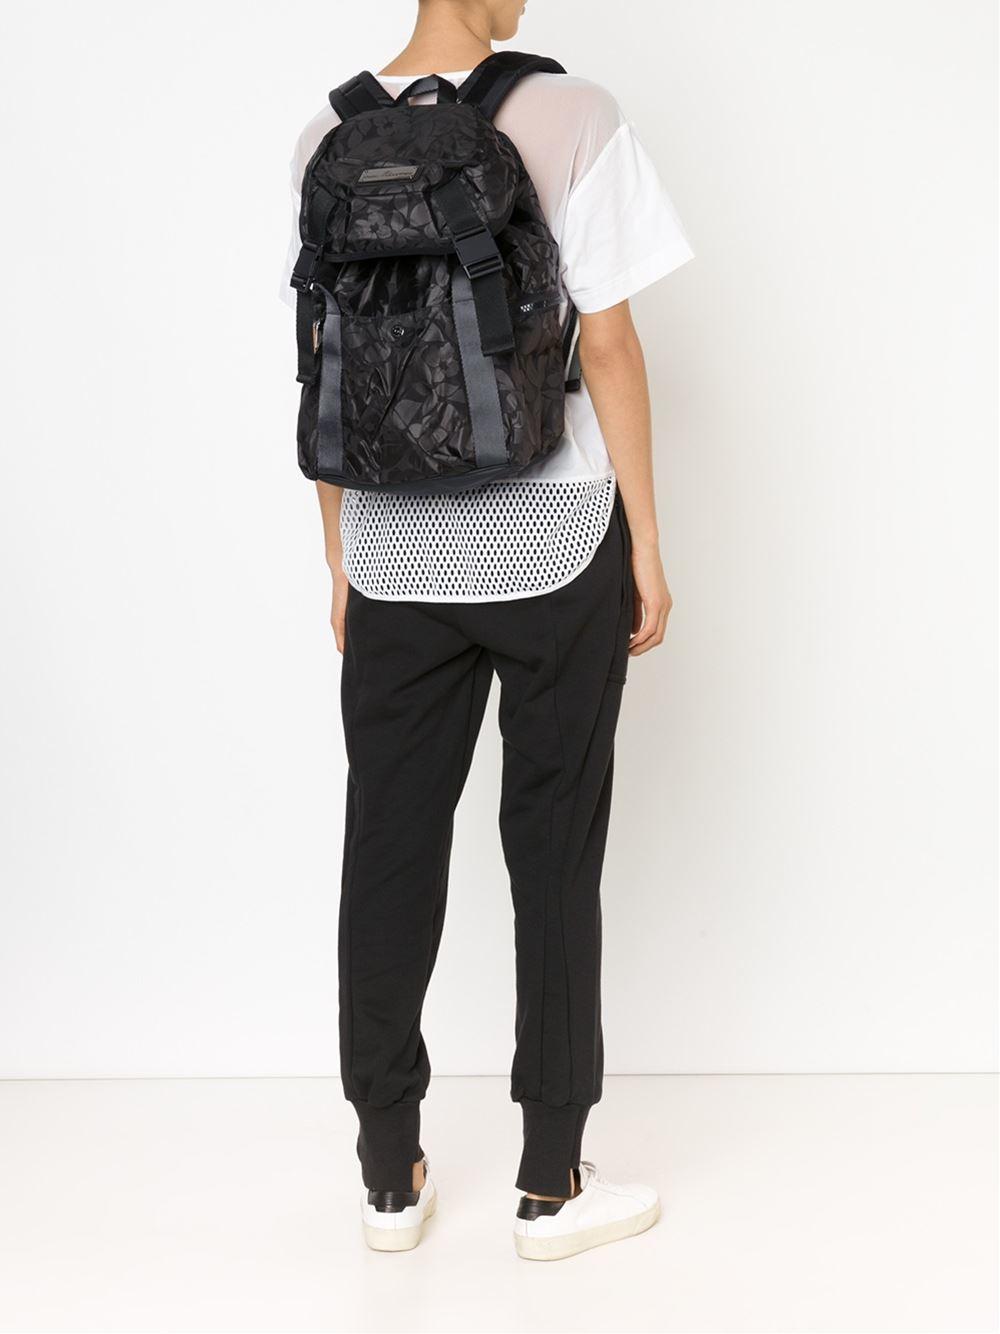 adidas by stella mccartney 39 weekender 39 backpack in gray. Black Bedroom Furniture Sets. Home Design Ideas